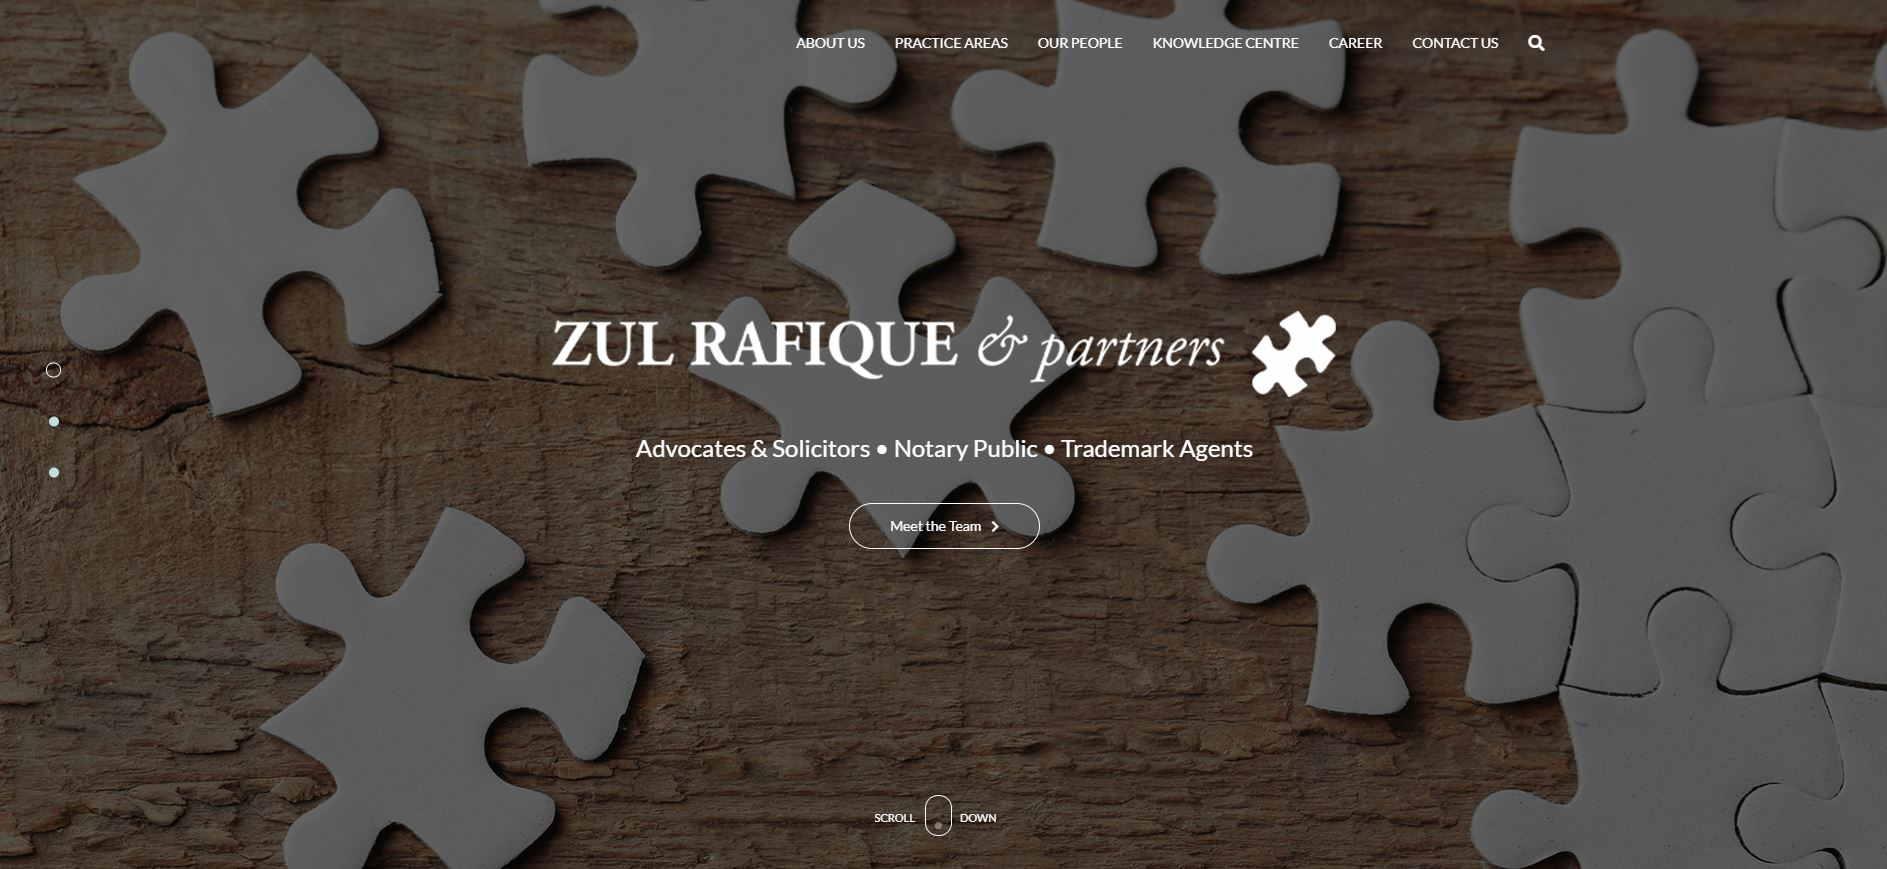 web design for lawyers_zul rafique partners